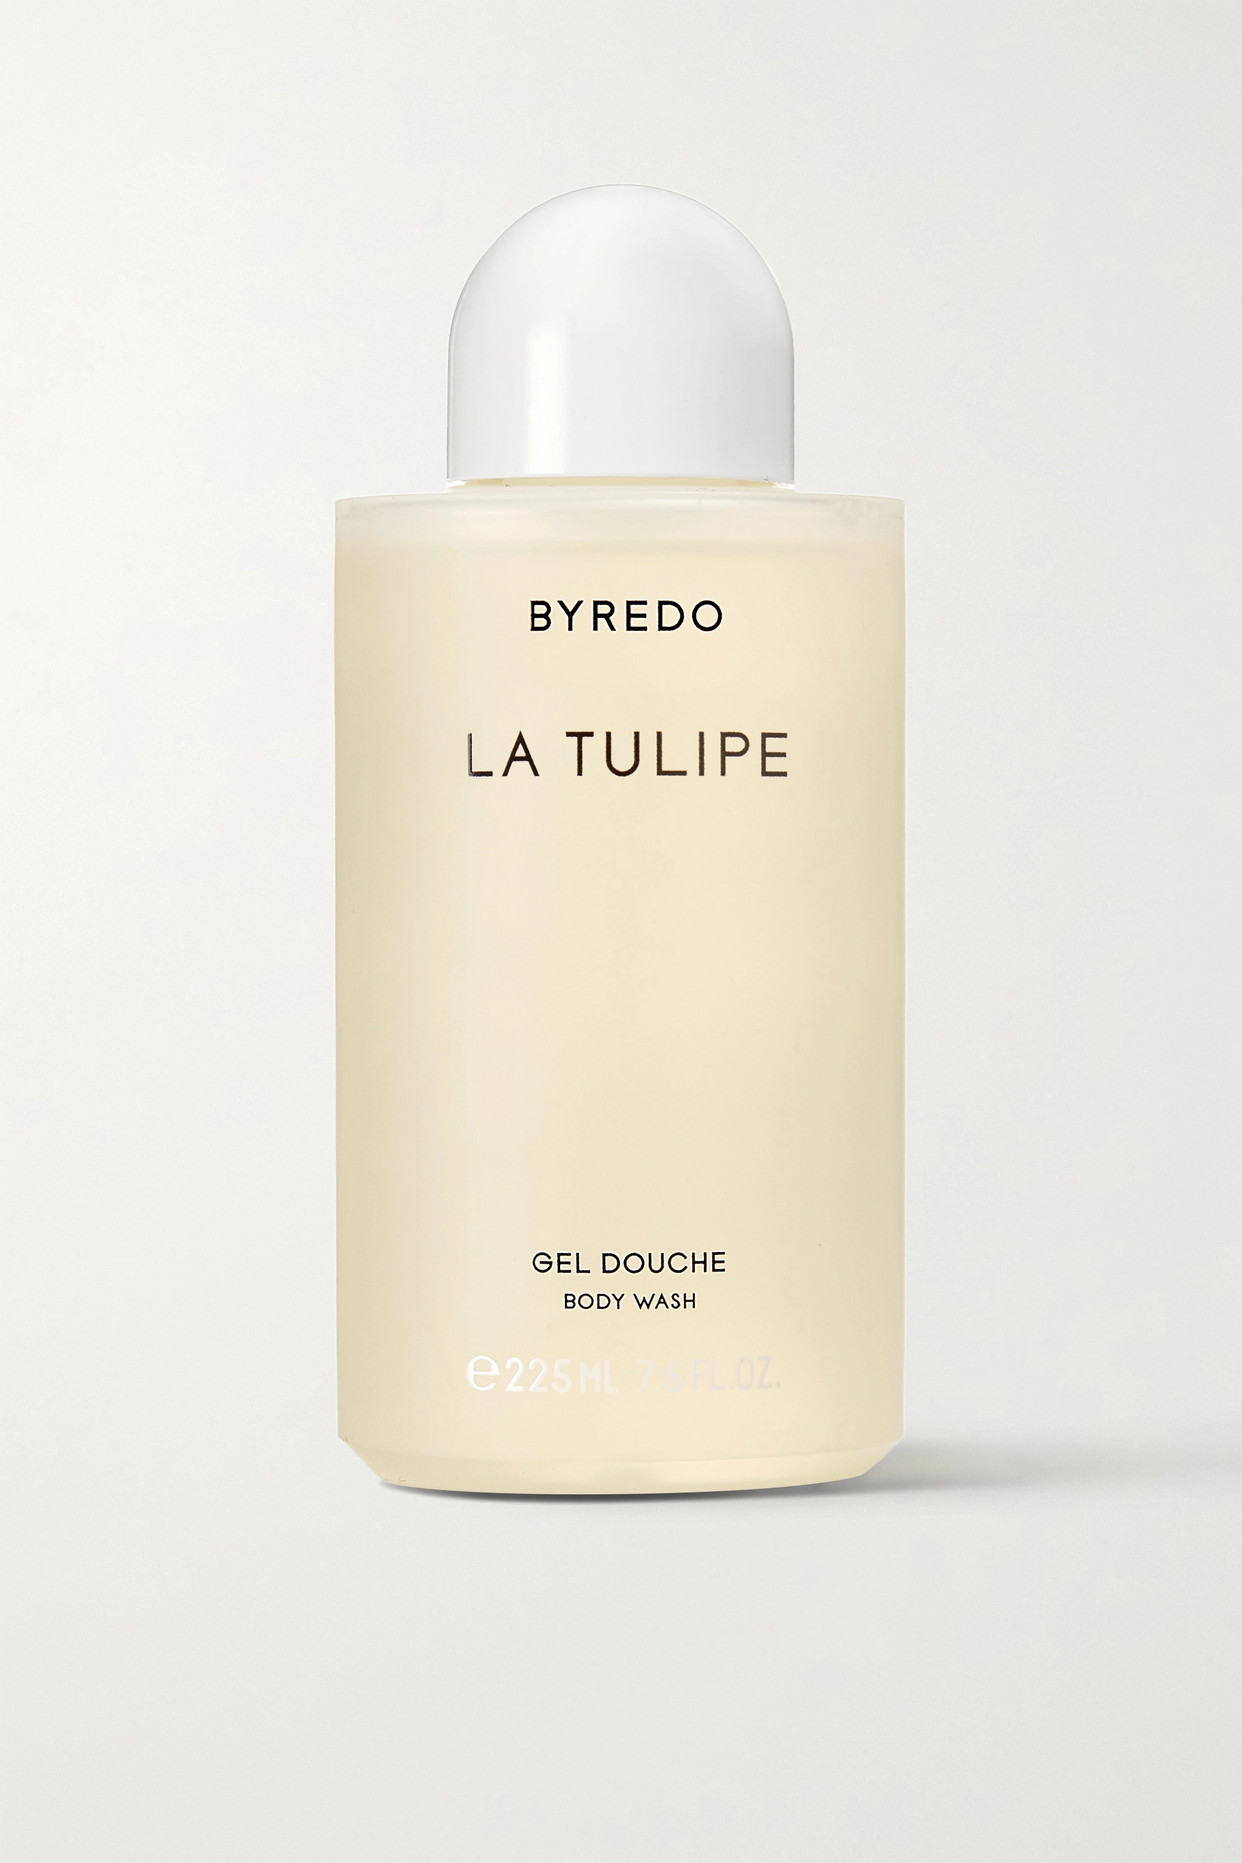 BYREDO - La Tulipe Body Wash, 225ml - one size